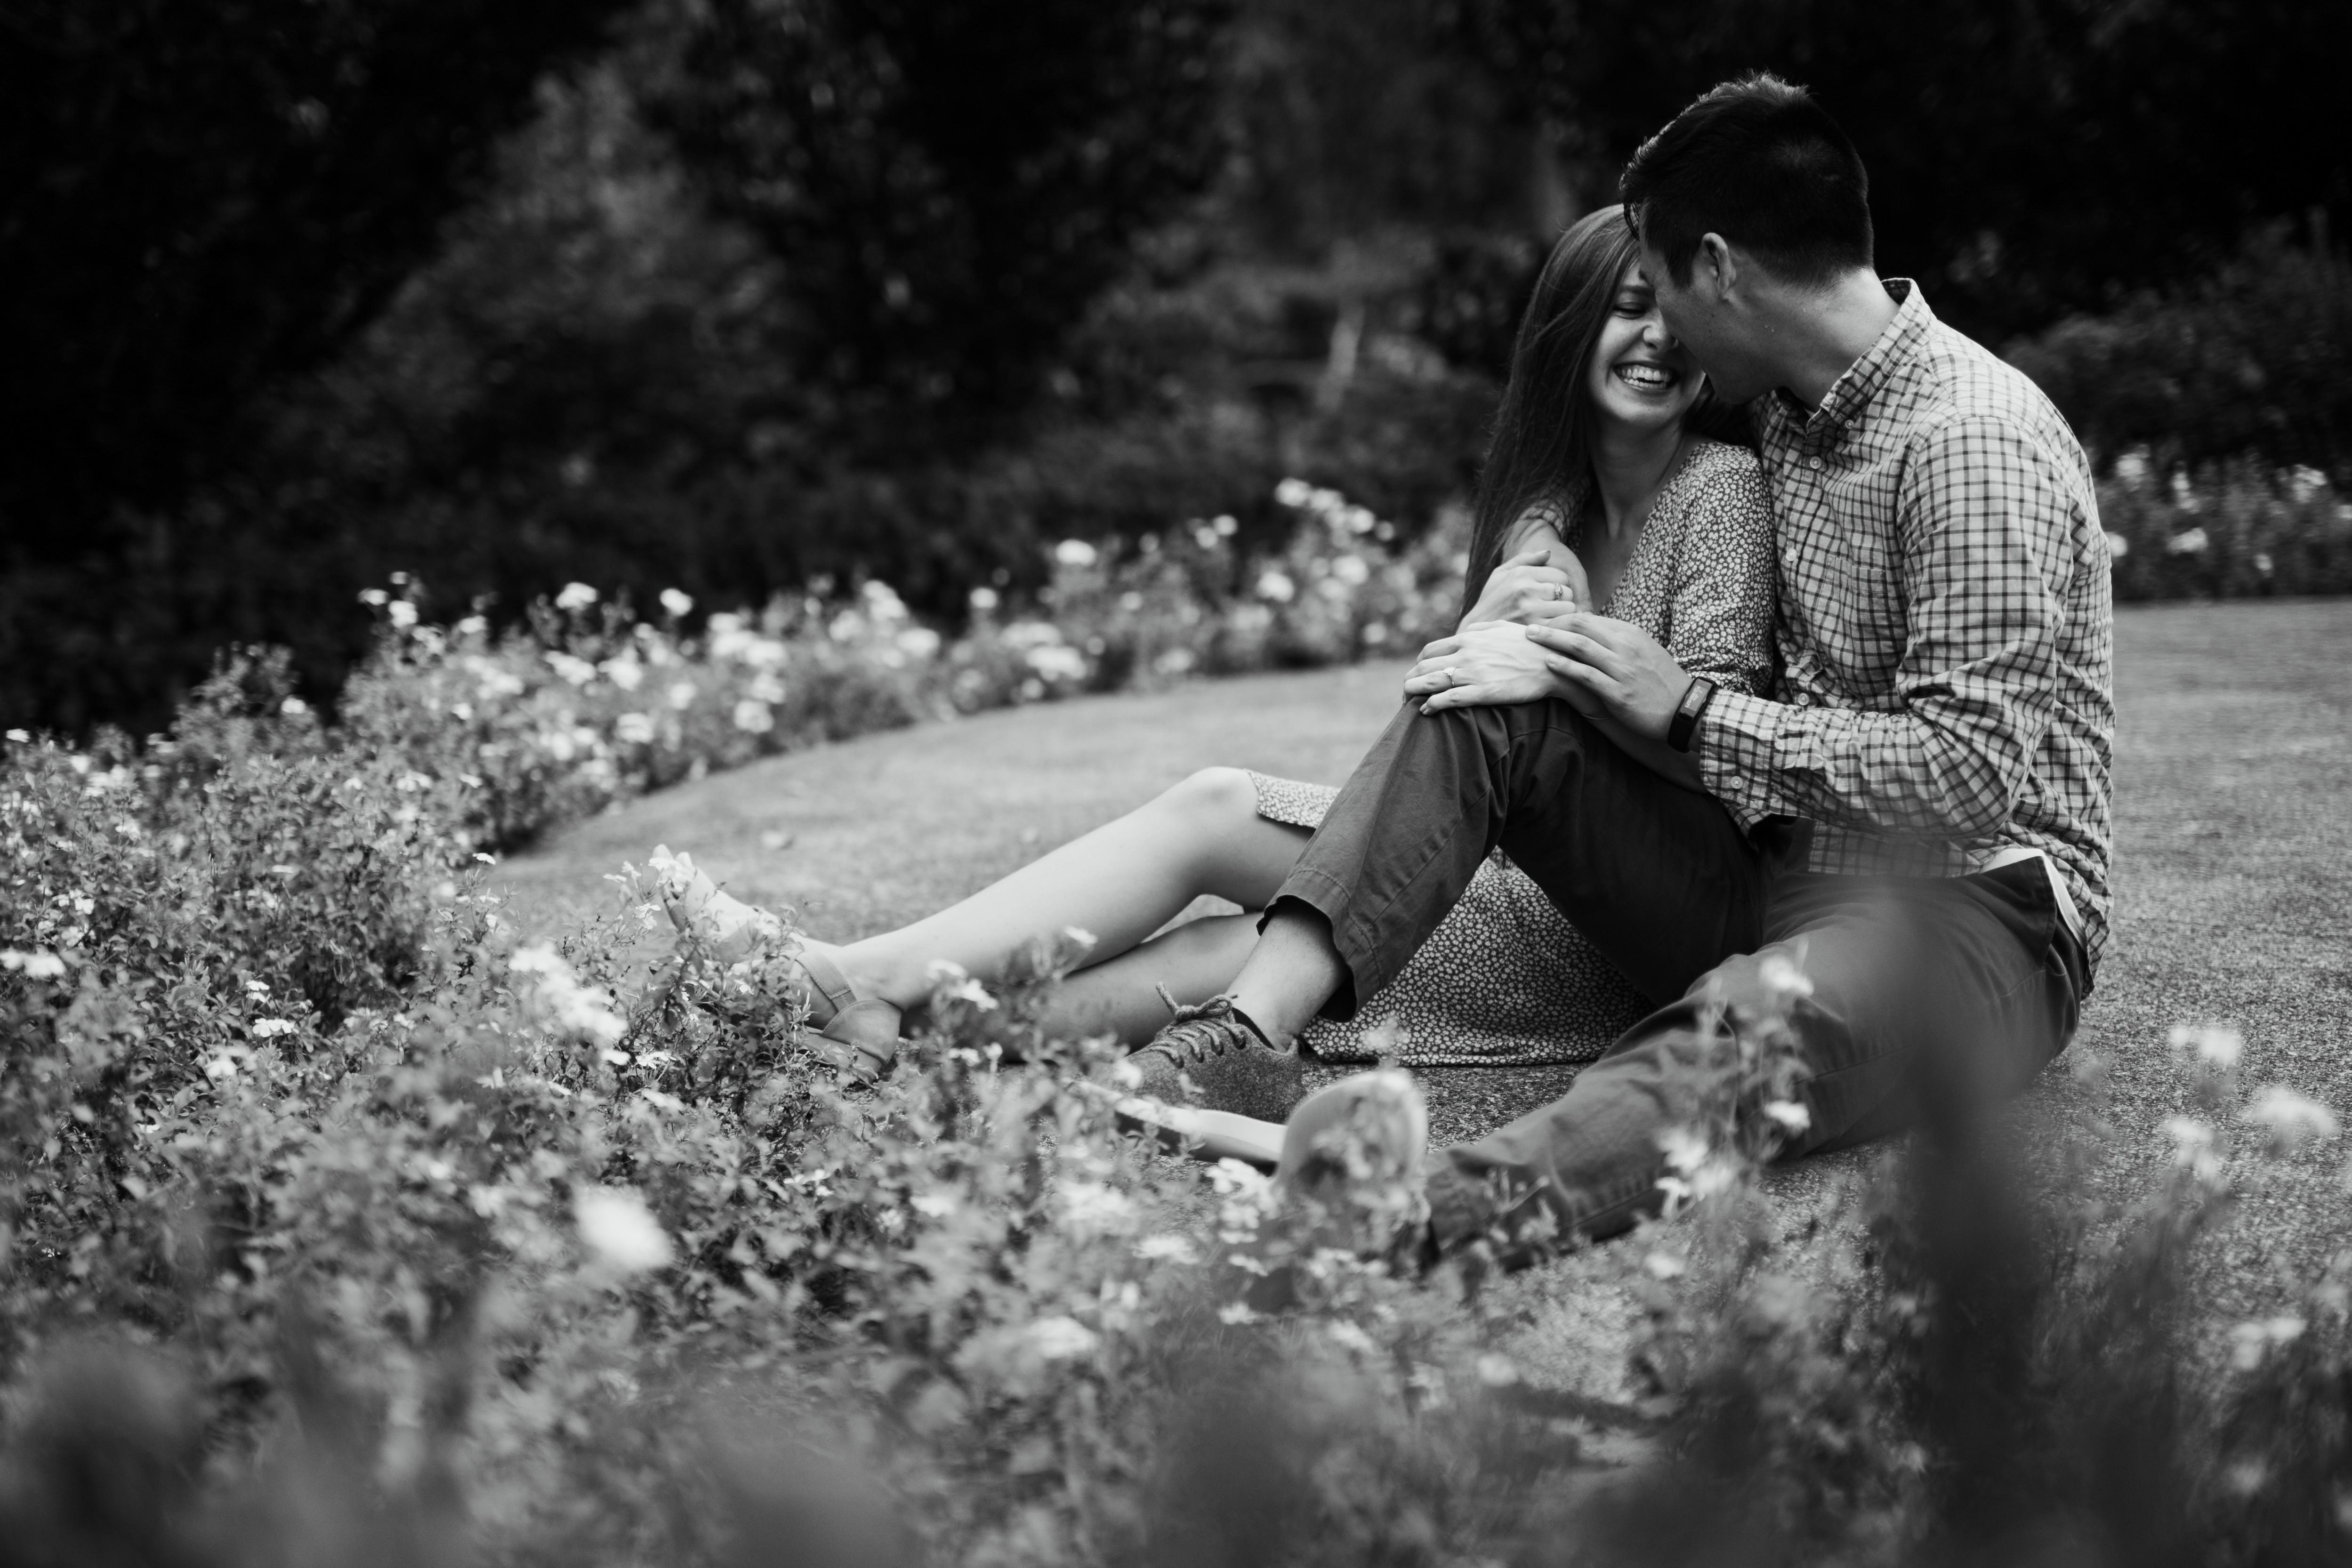 singapore botanic gardens, botanic gardens, botanical gardens singapore, botanical gardens prewedding, prewedding shoot singapore, singapore wedding photographer, prewedding photographer singapore, prewedding photographer, female wedding photographer, female prewedding photographer, nataliewongphotography, black and white prewedding